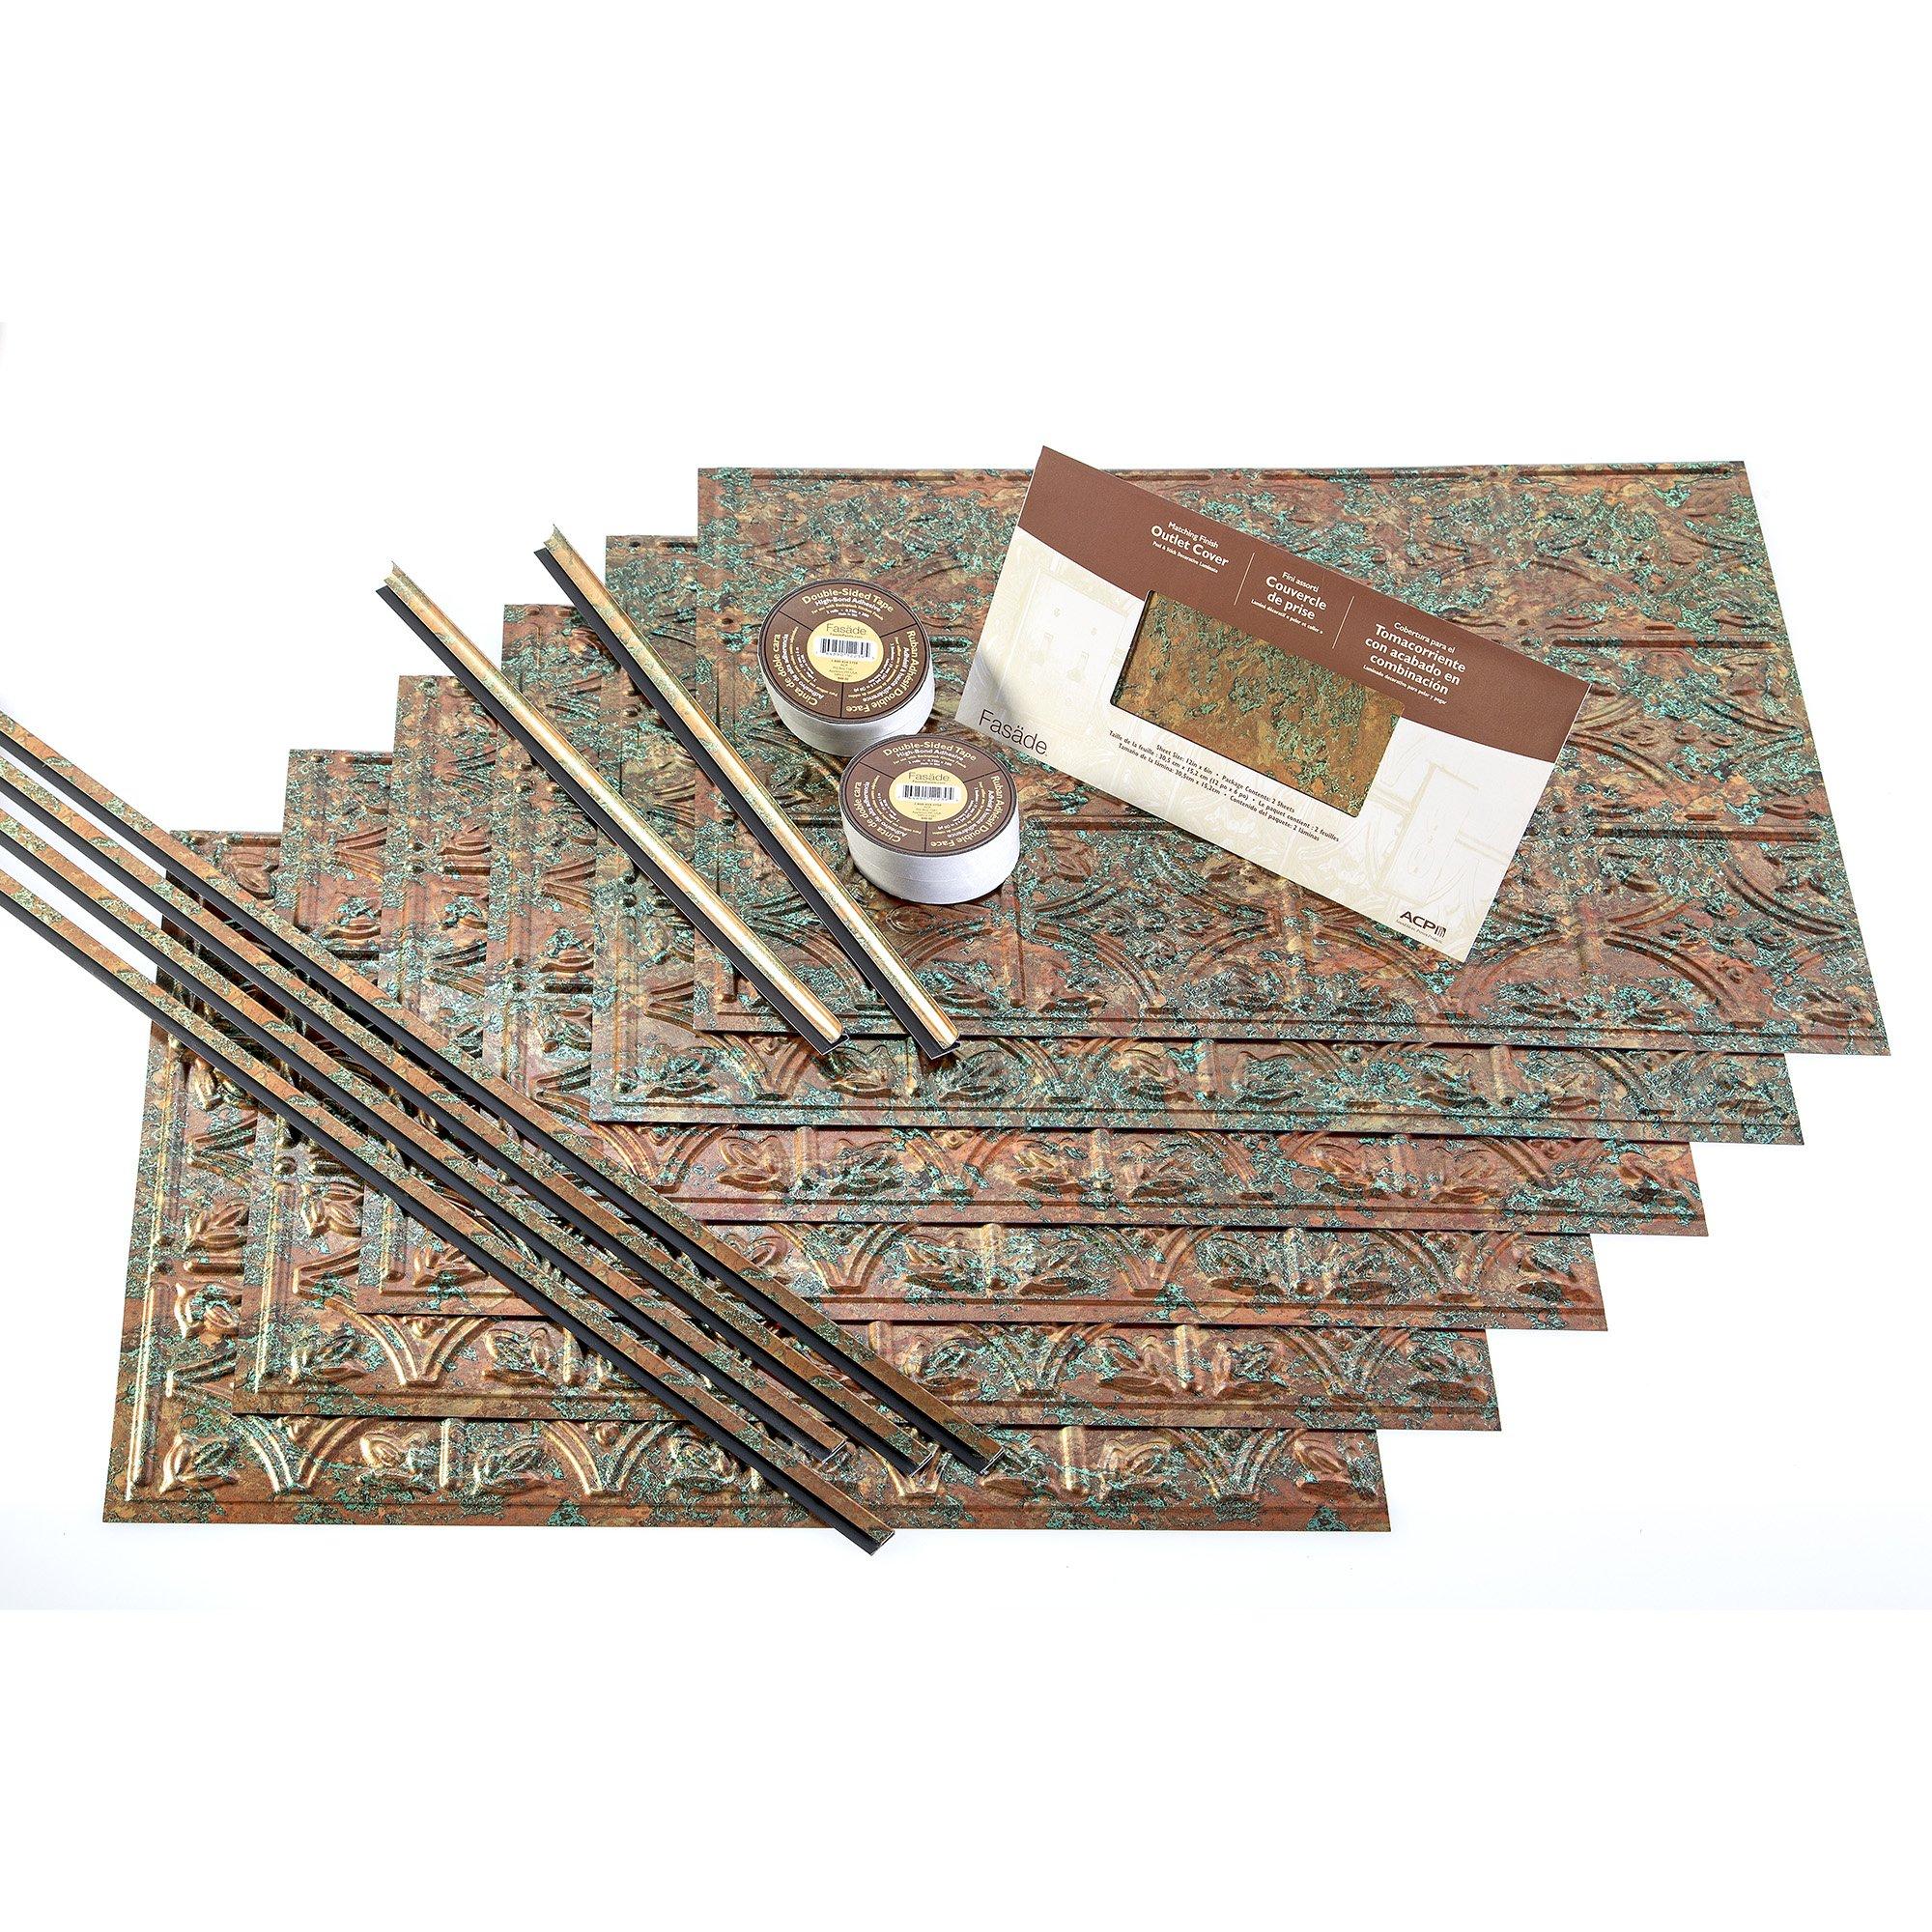 FASÄDE Easy Installation Traditional 1 Copper Fantasy Backsplash Panel for Kitchen and Bathrooms (18 sq ft Kit)